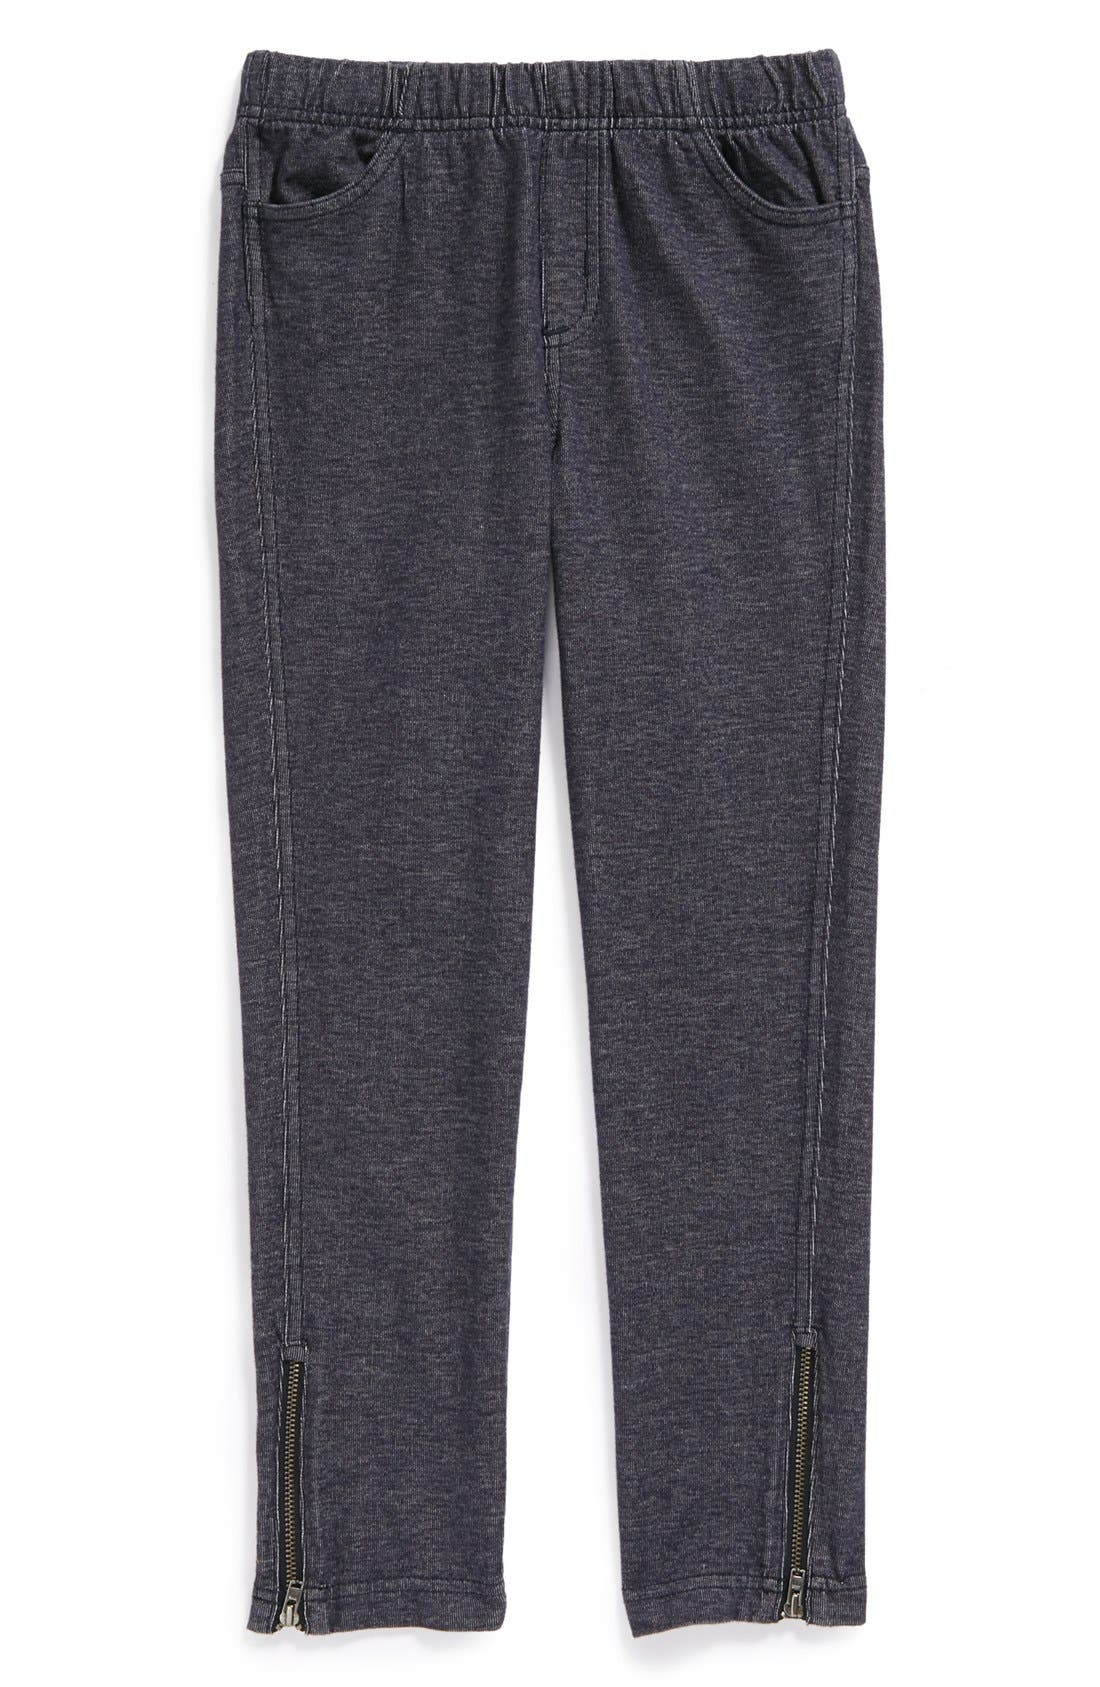 Main Image - Tea Collection Knit Skinny Leg Pants (Little Girls & Big Girls)